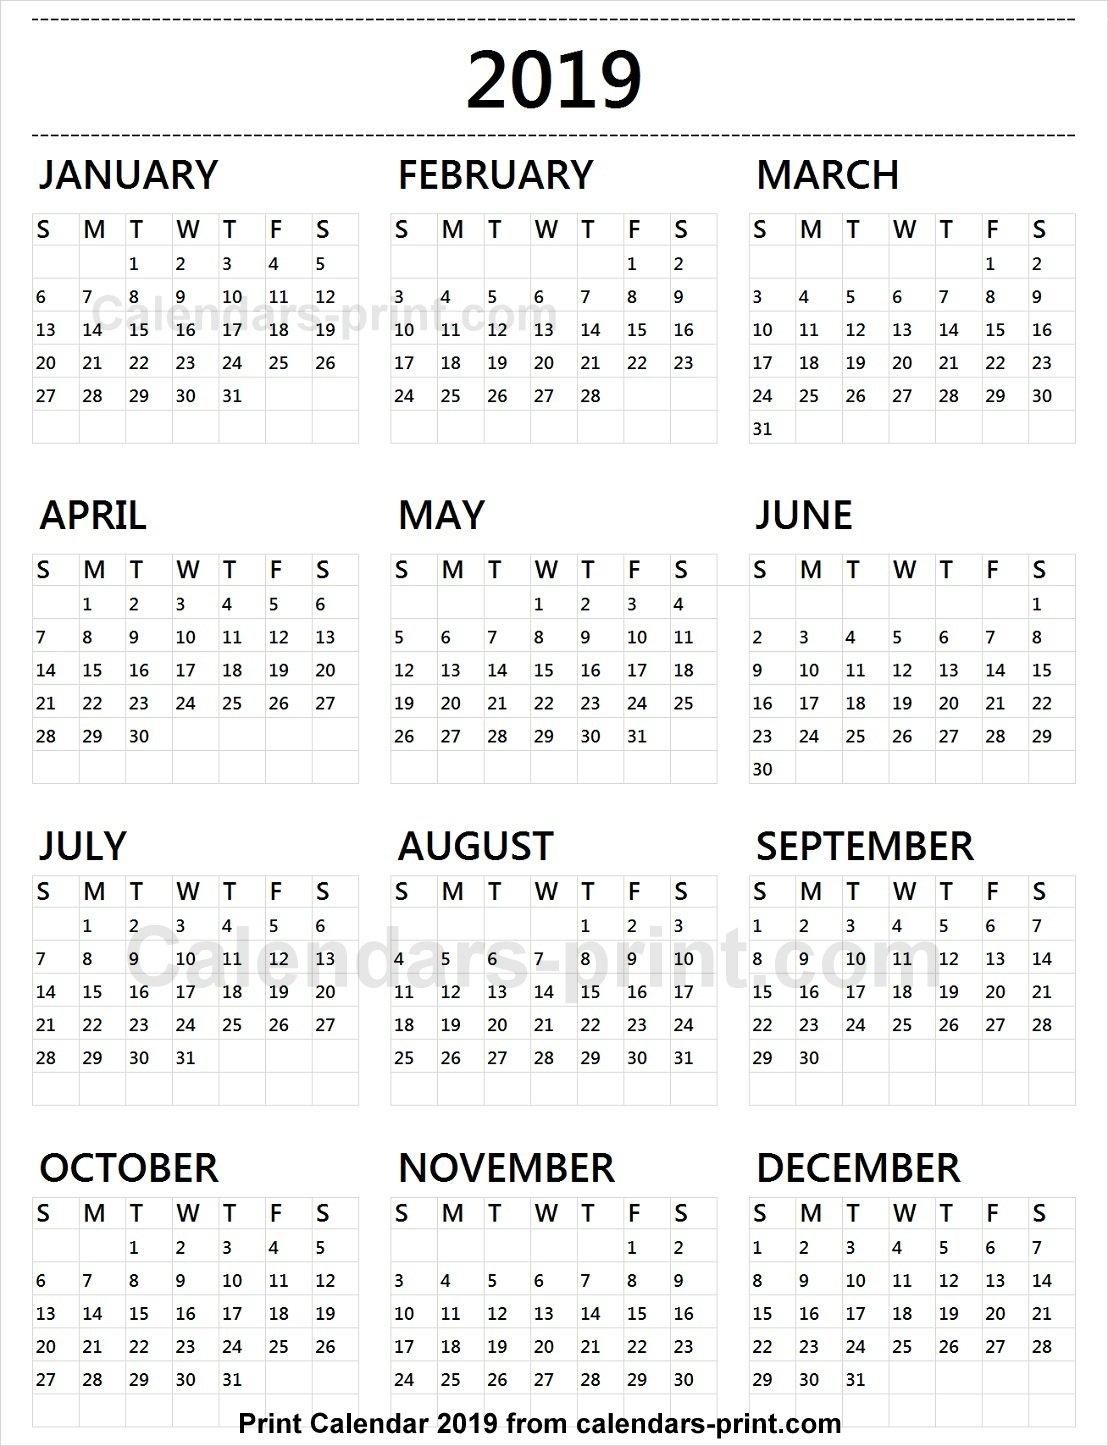 Calendar 2019 Tumblr To Print Free | Download Blank Pdf Template Calendar 2019 Print Free